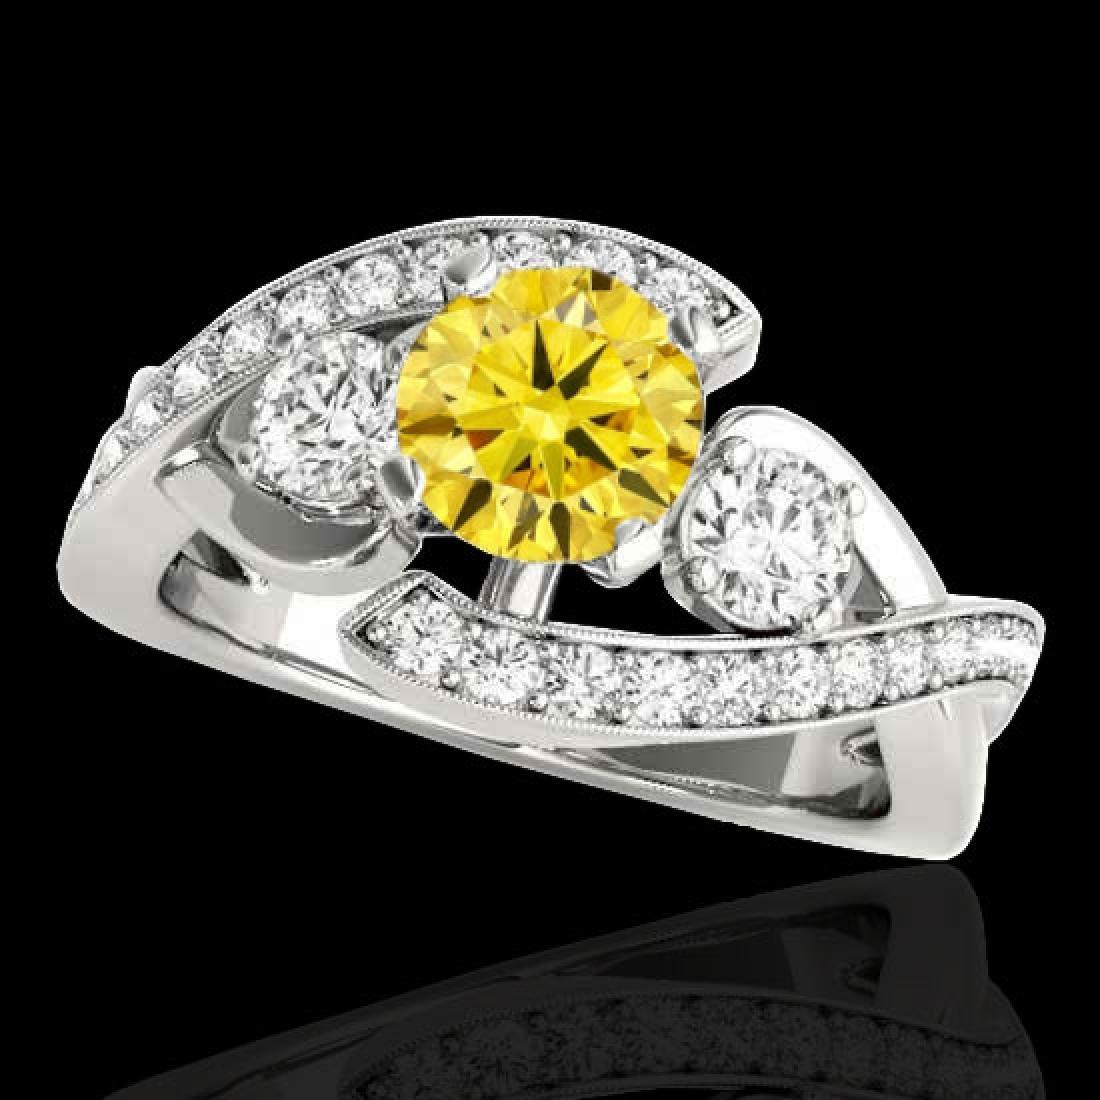 2.26 CTW Certified Si Intense Yellow Diamond Bypass